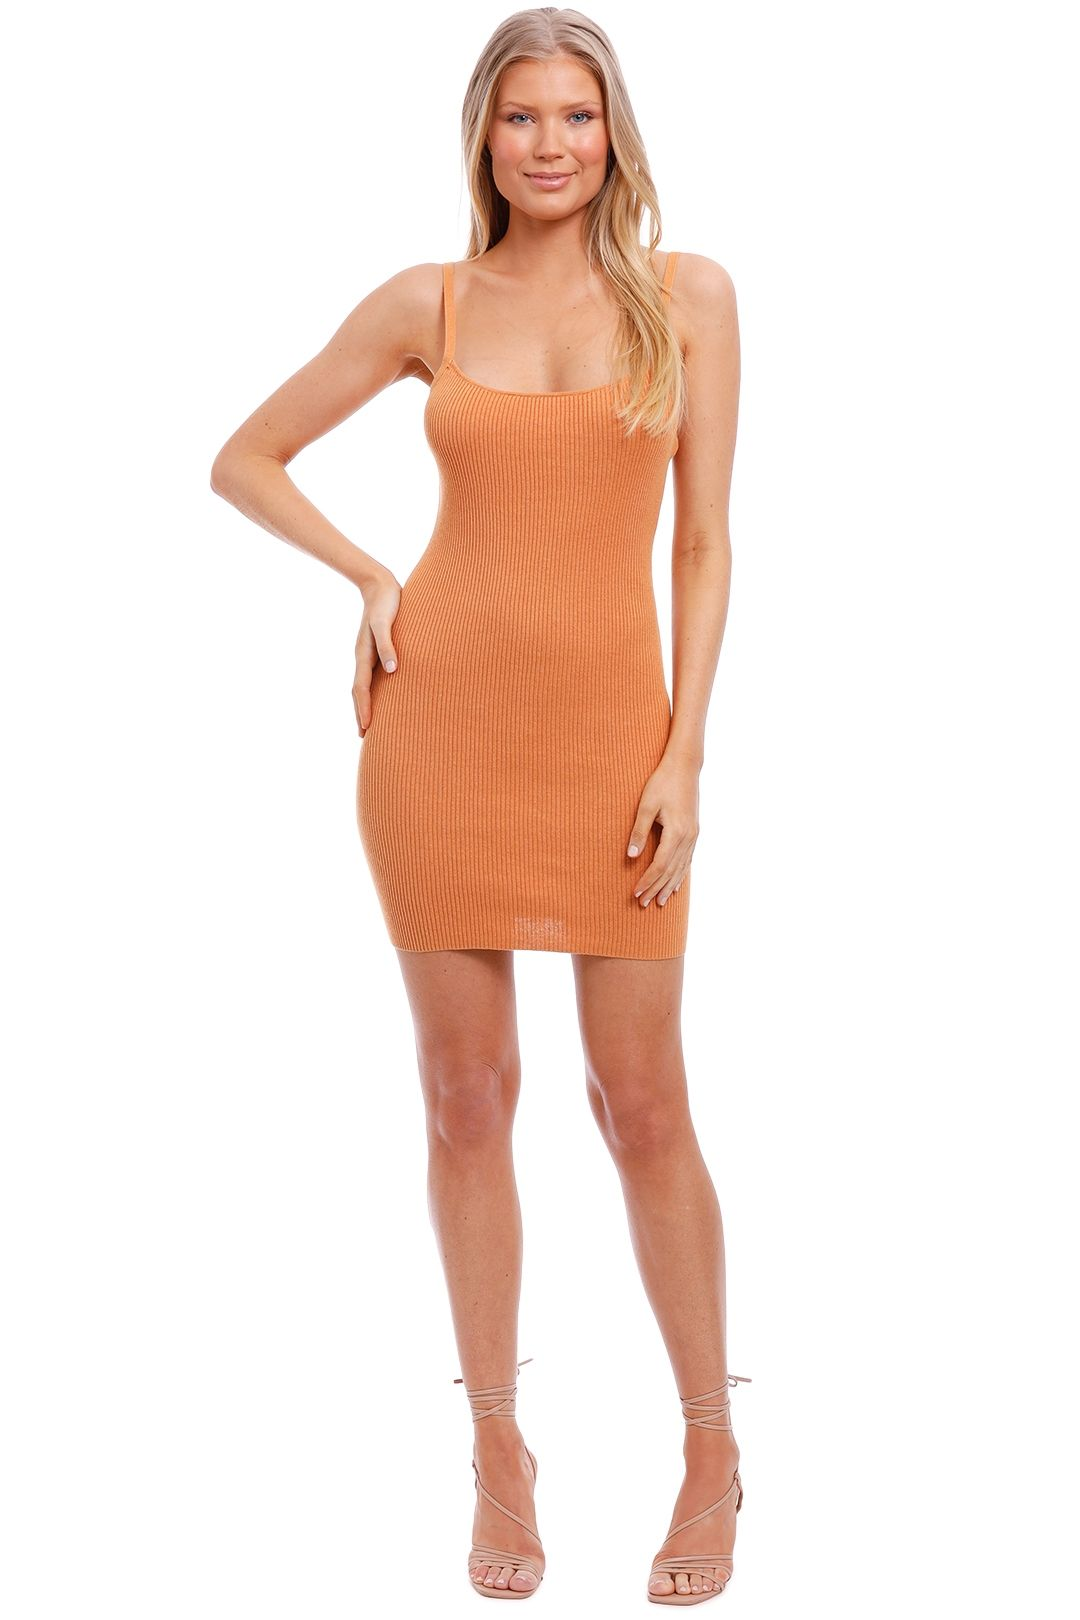 Bec and Bridge Margot Knit Mini Dress Nutmeg brown